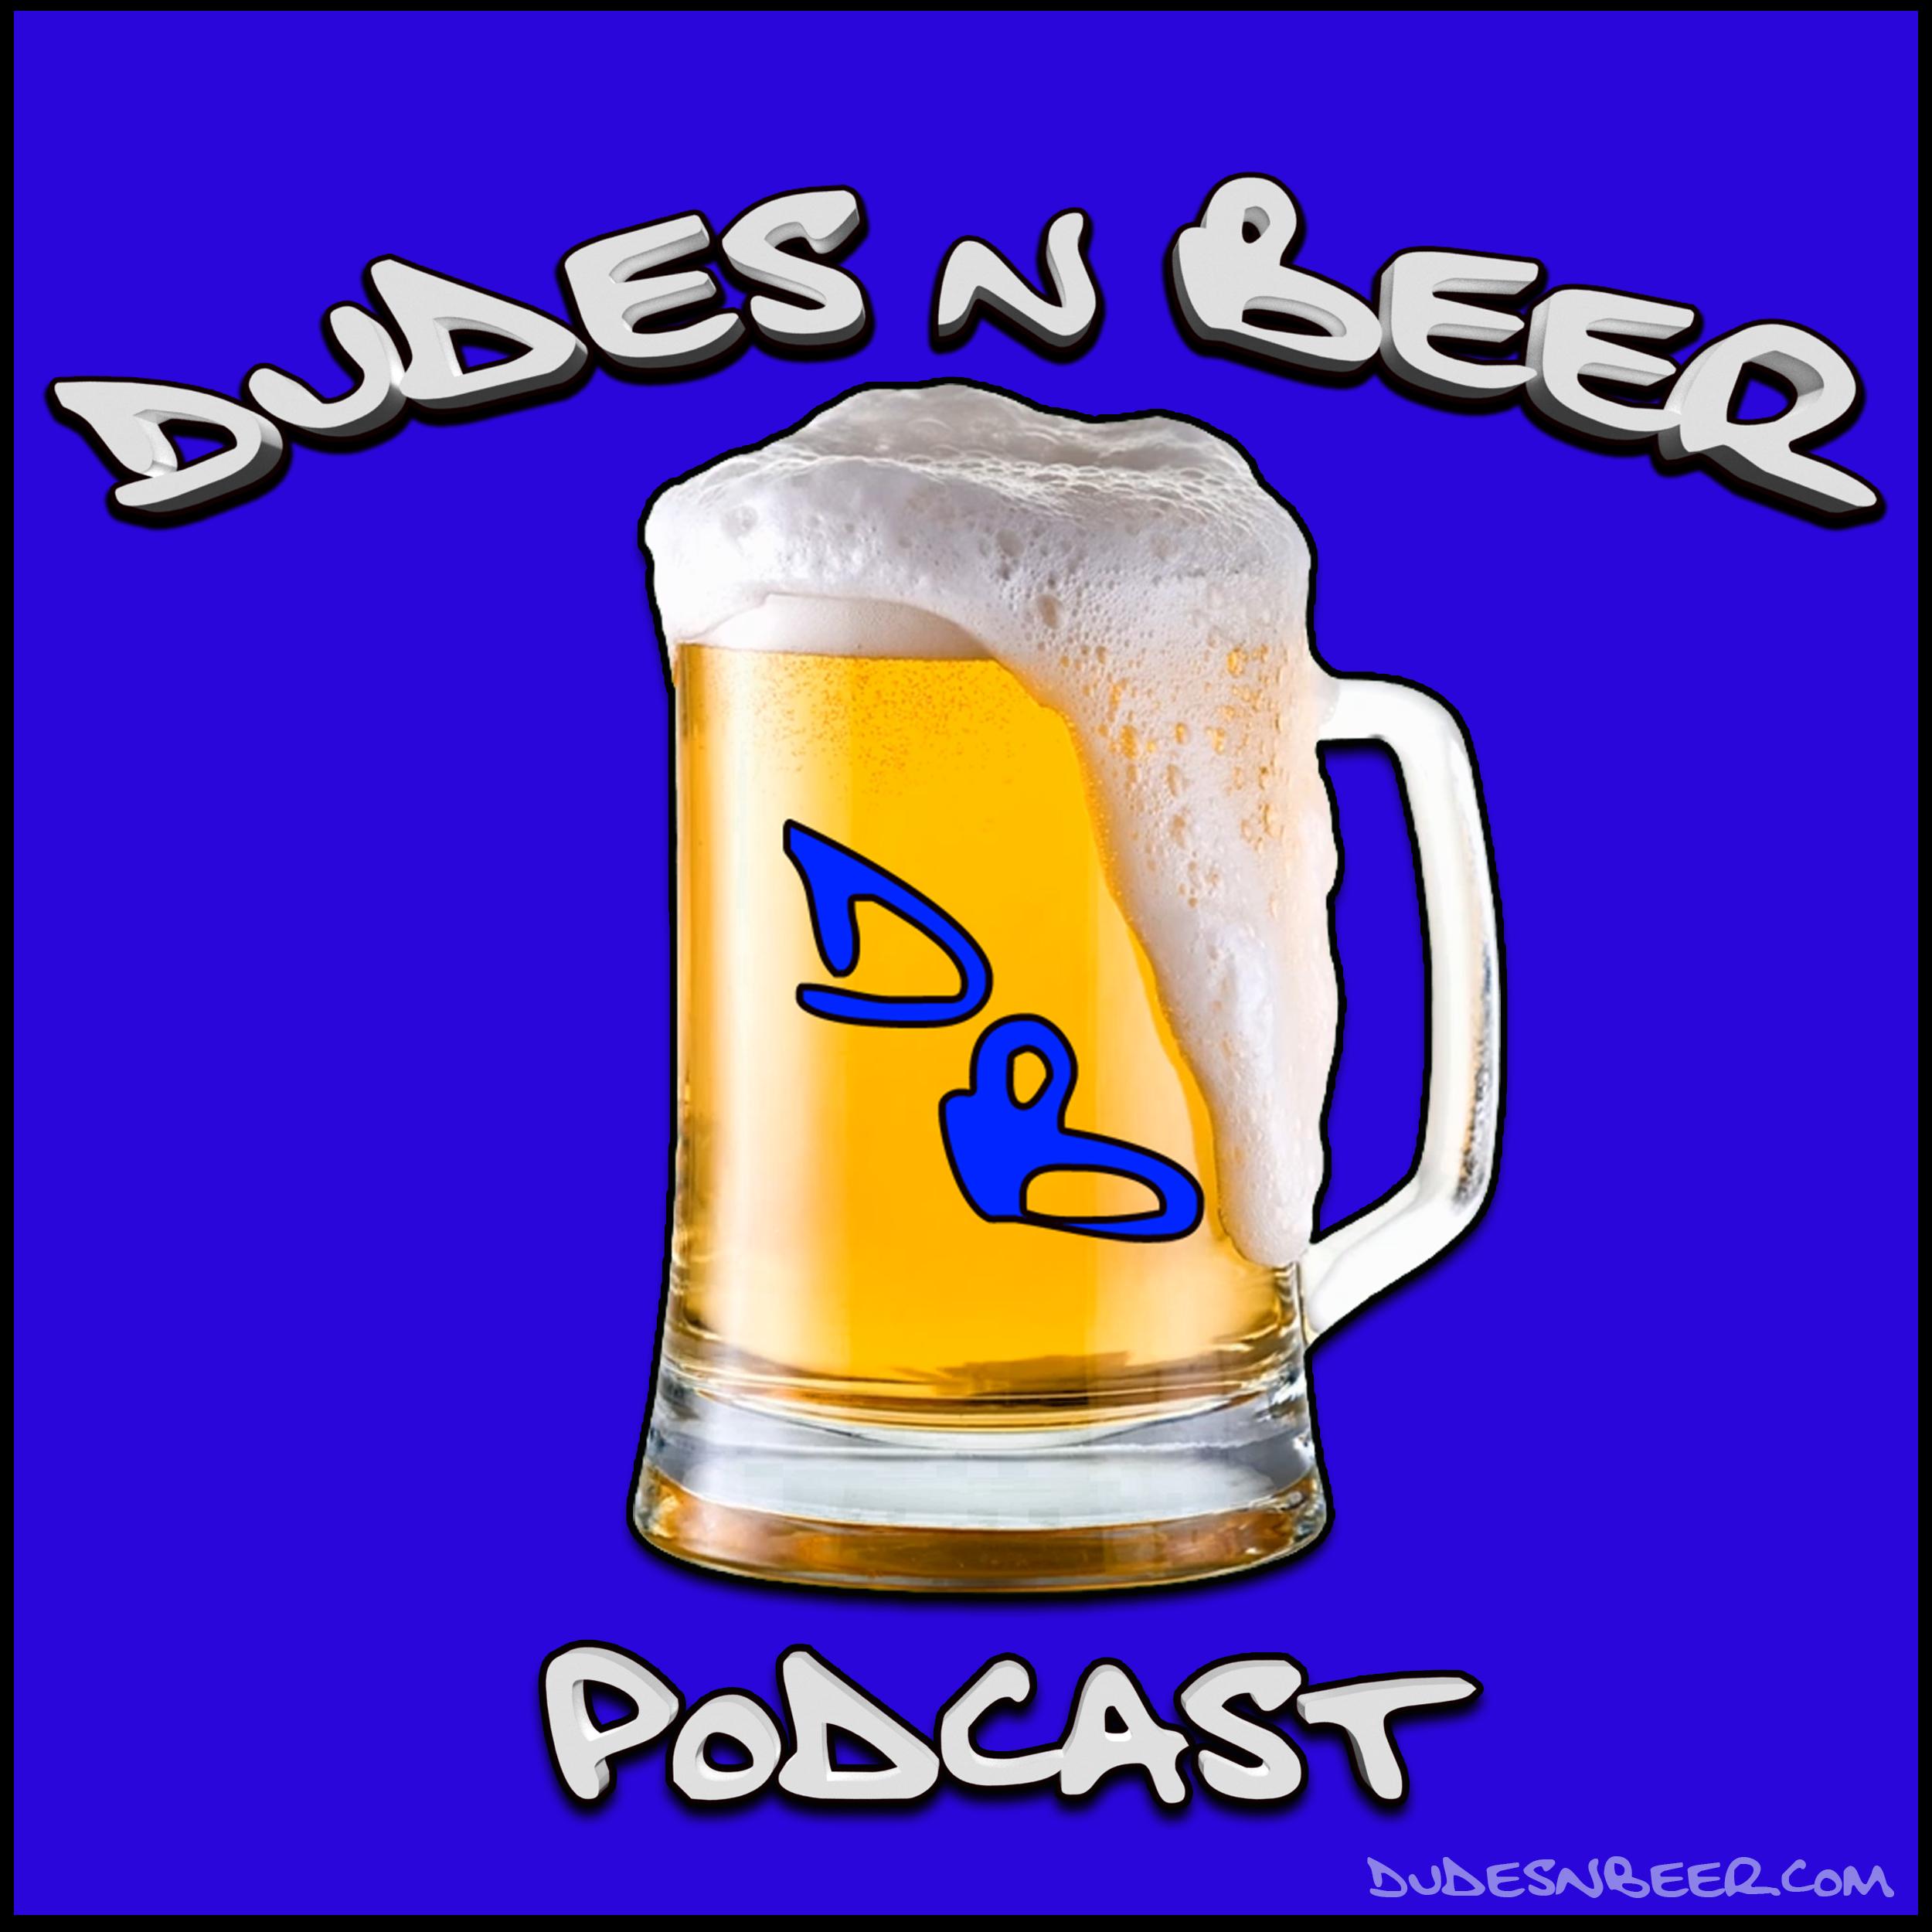 Dudes n Beer Podcast